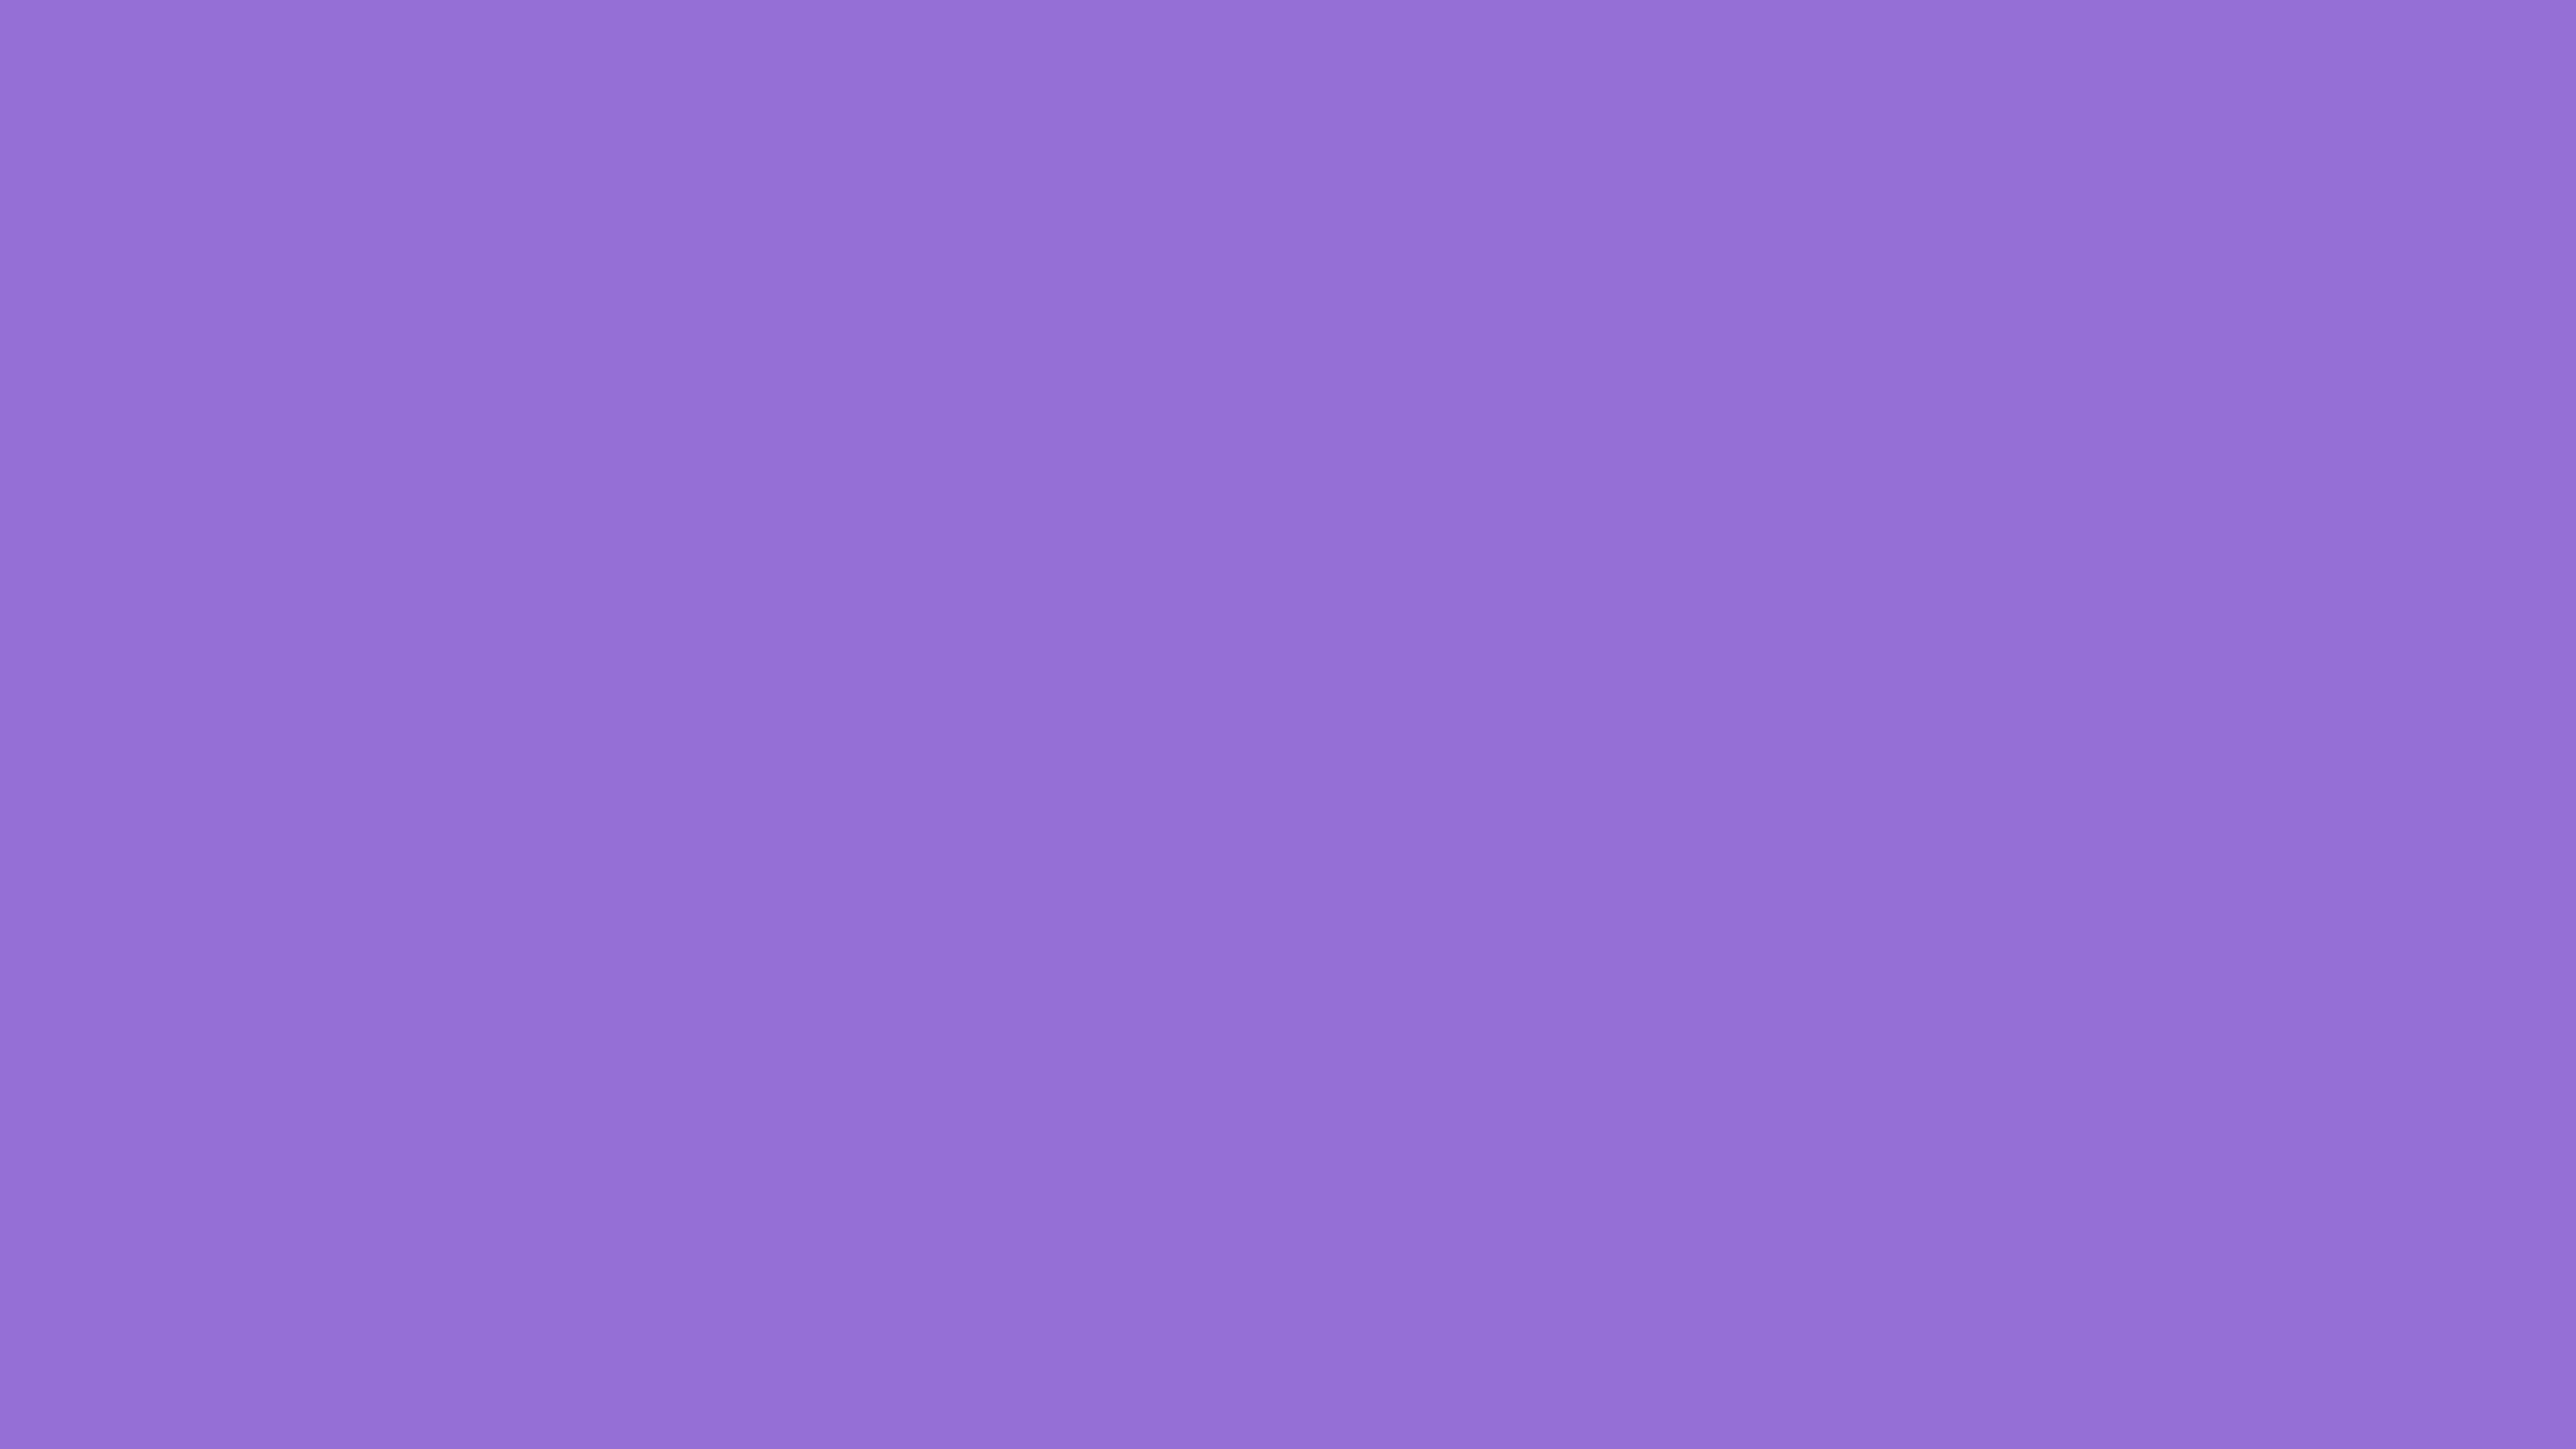 4096x2304 Dark Pastel Purple Solid Color Background